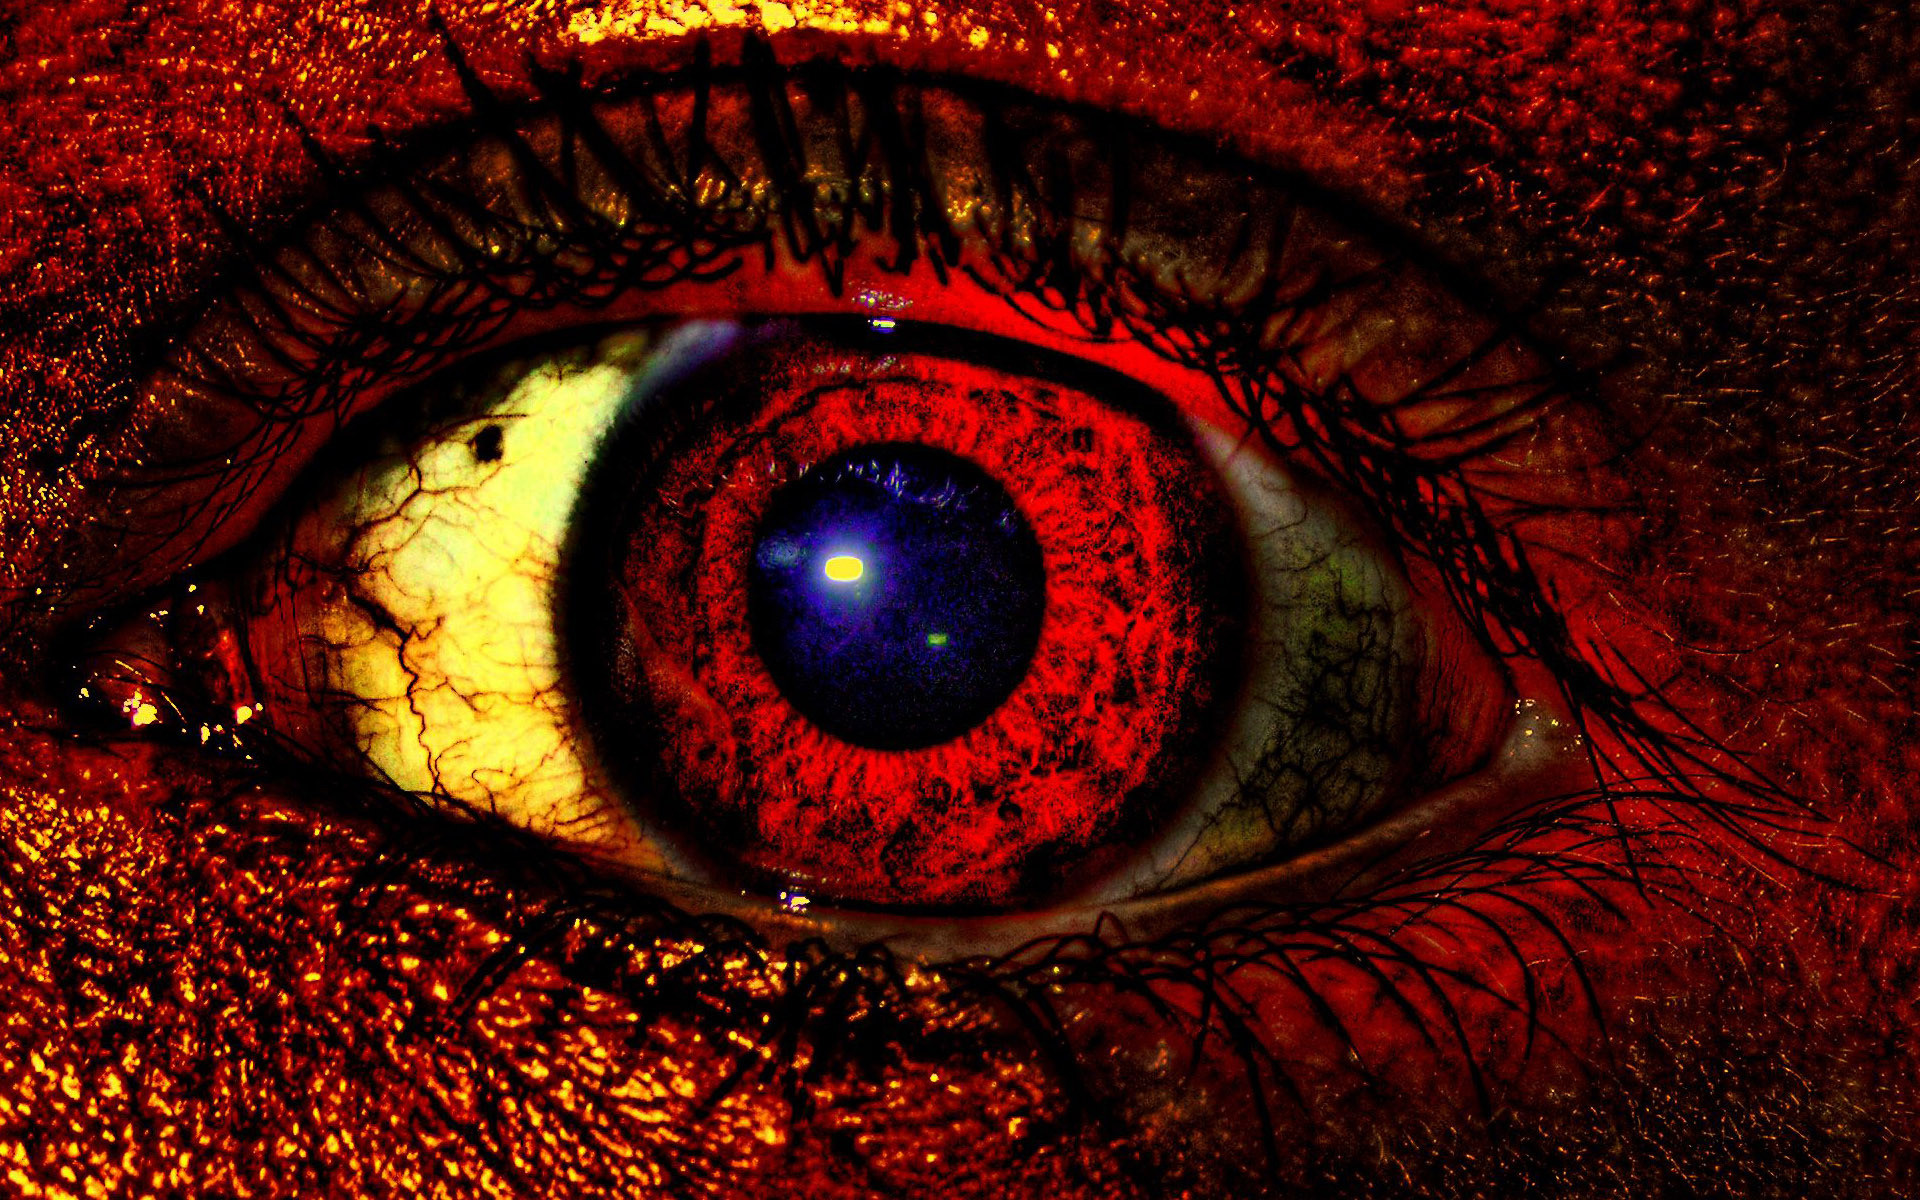 Red Eye Wallpaper ·①